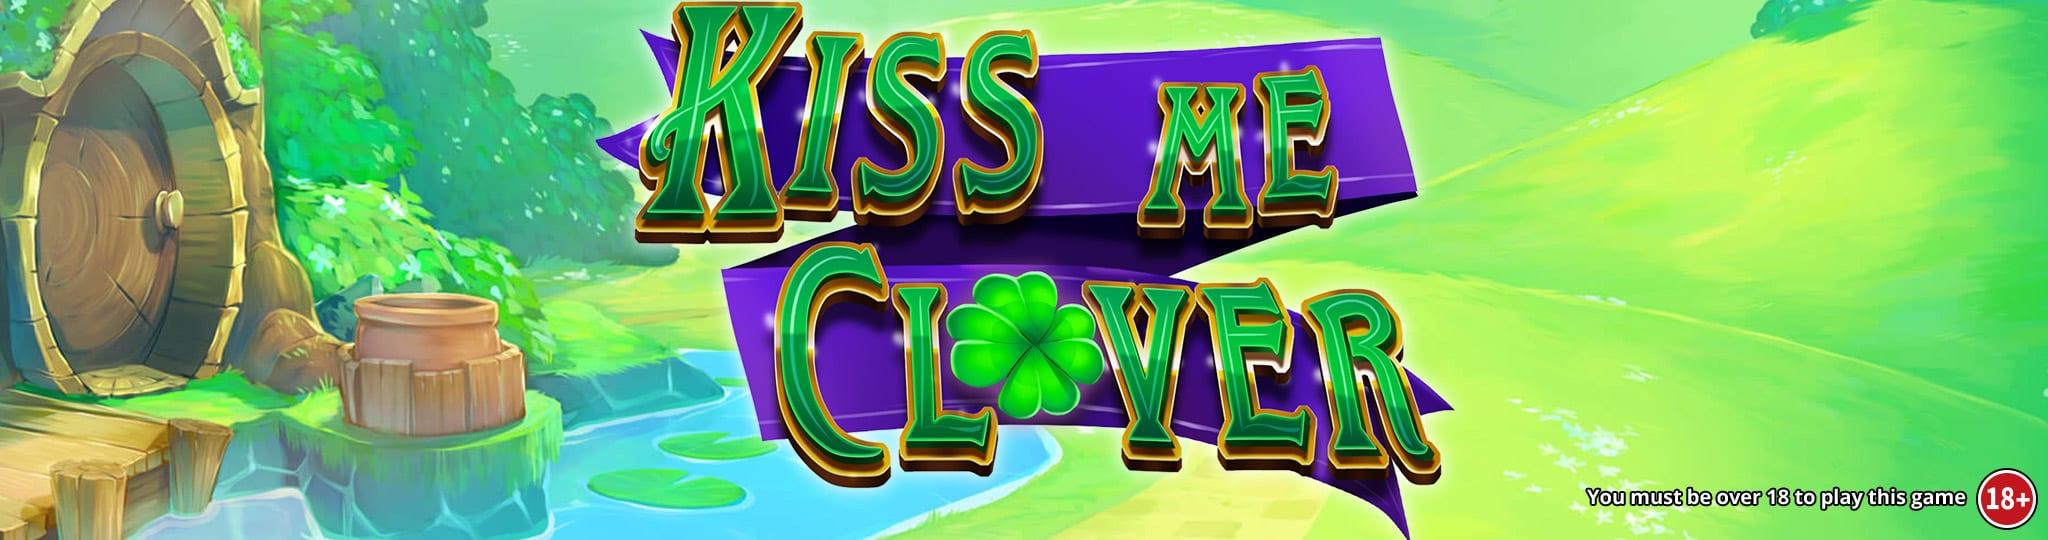 kiss me clover slots game logo